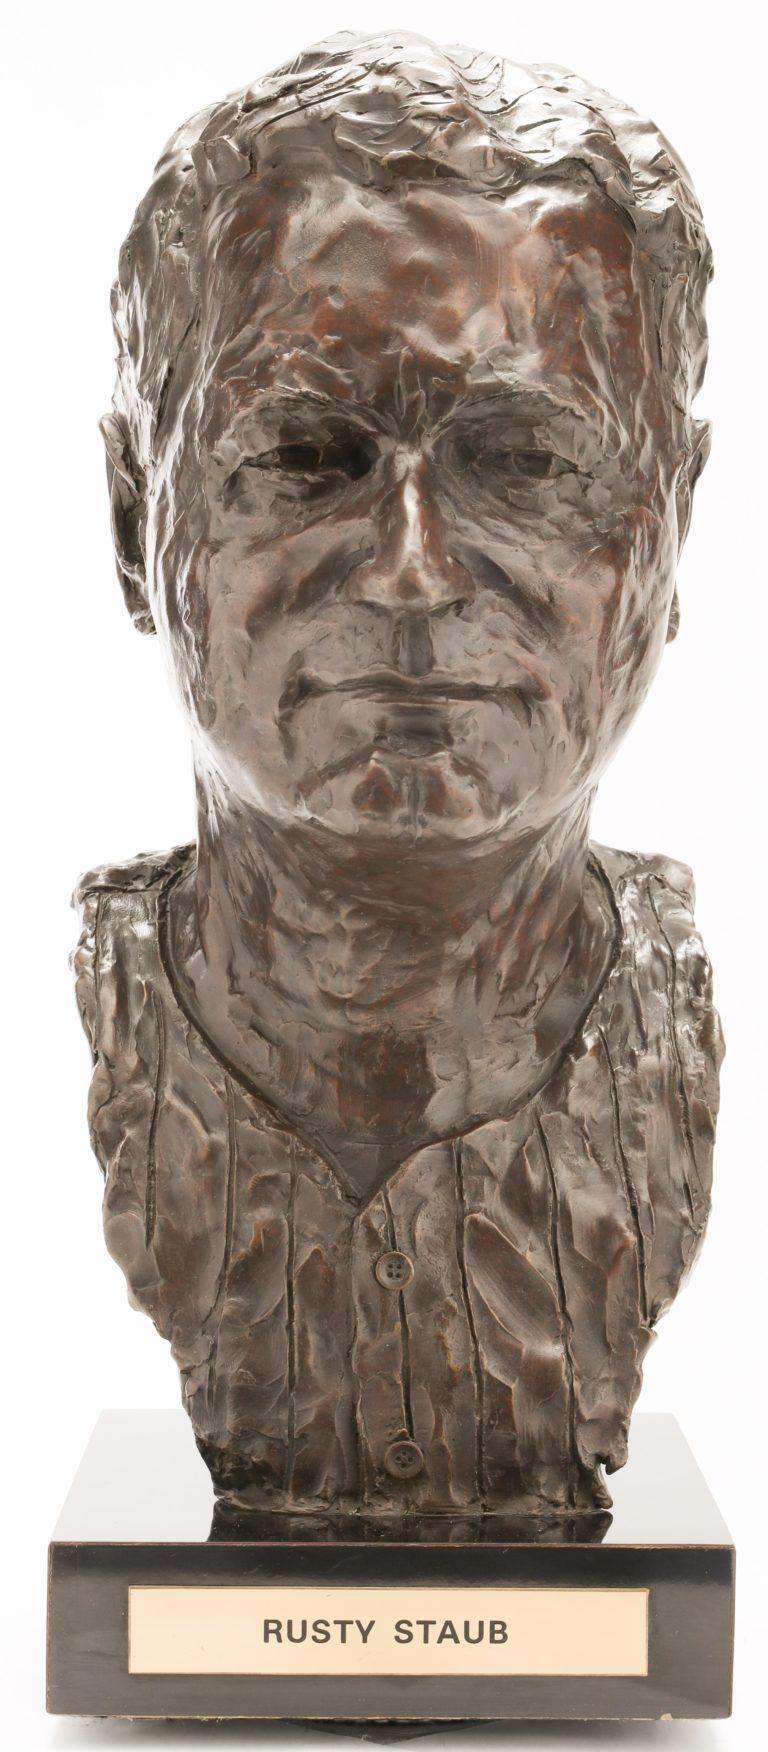 Rusty Staub Mets Hall of Fame Bust